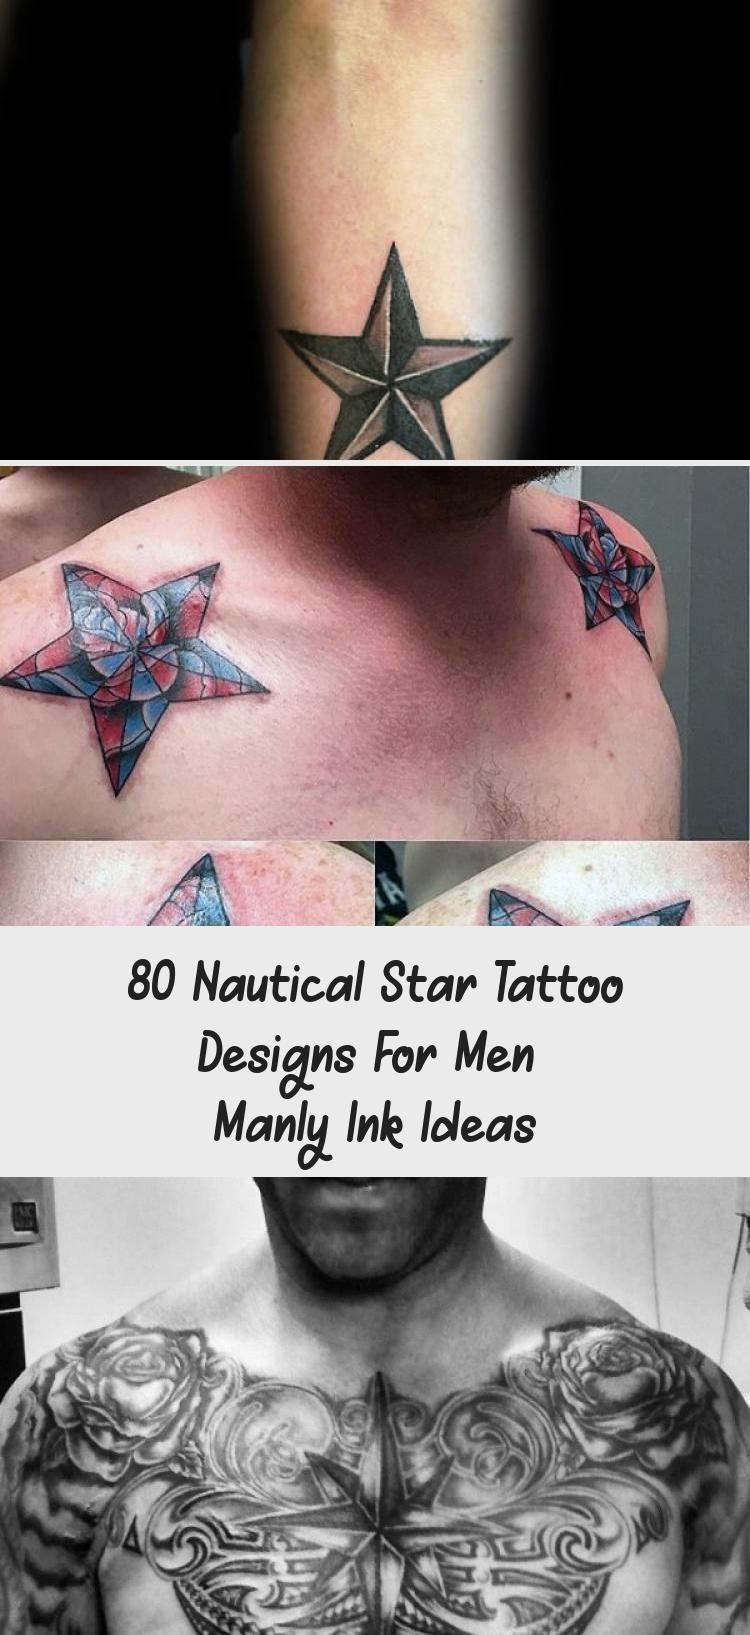 39++ Stunning Star tattoo designs for guys image ideas